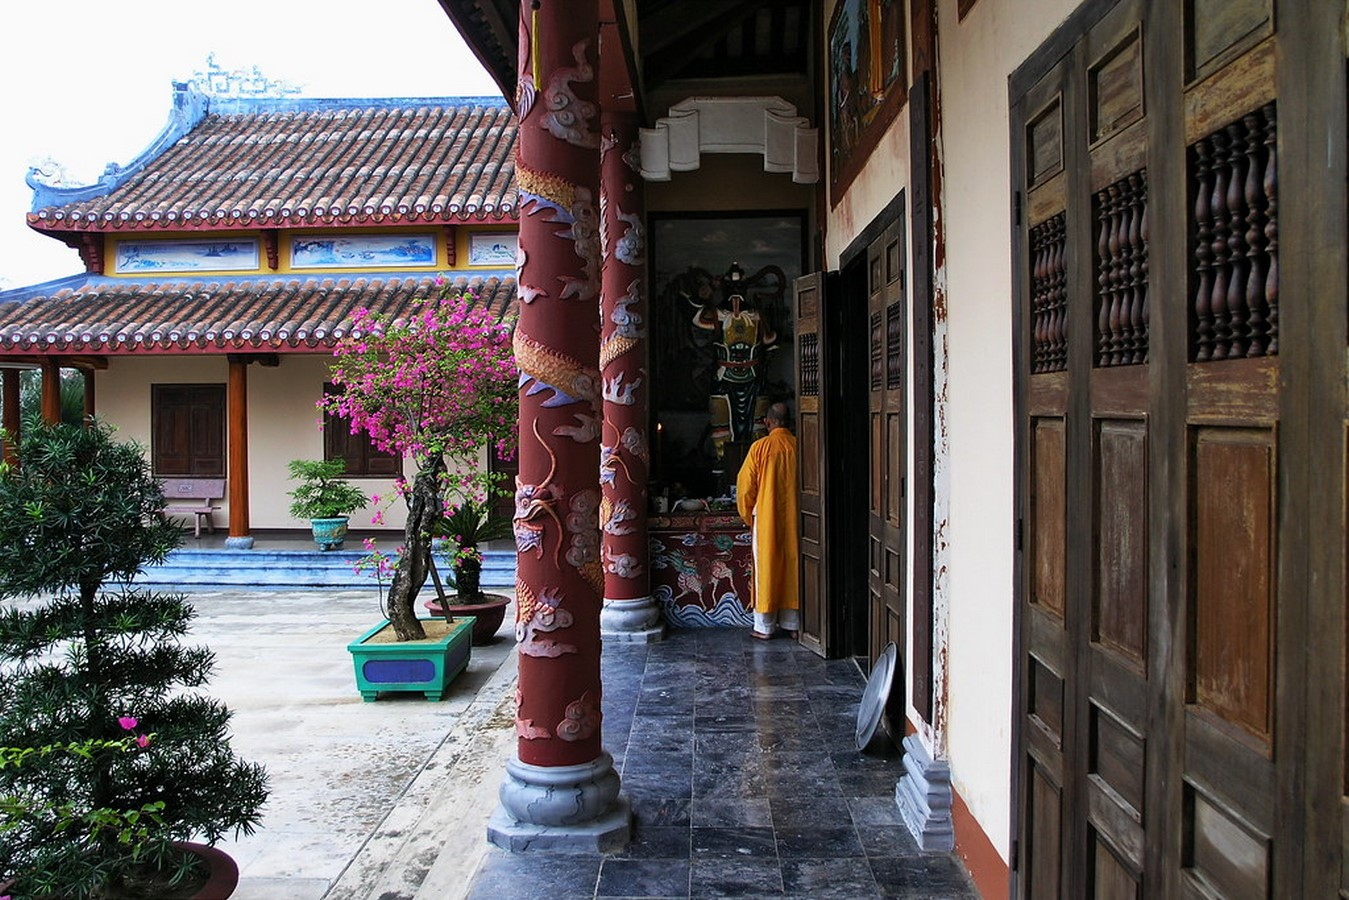 Phuoc Lam Pagoda In Vietnam - Sheet1